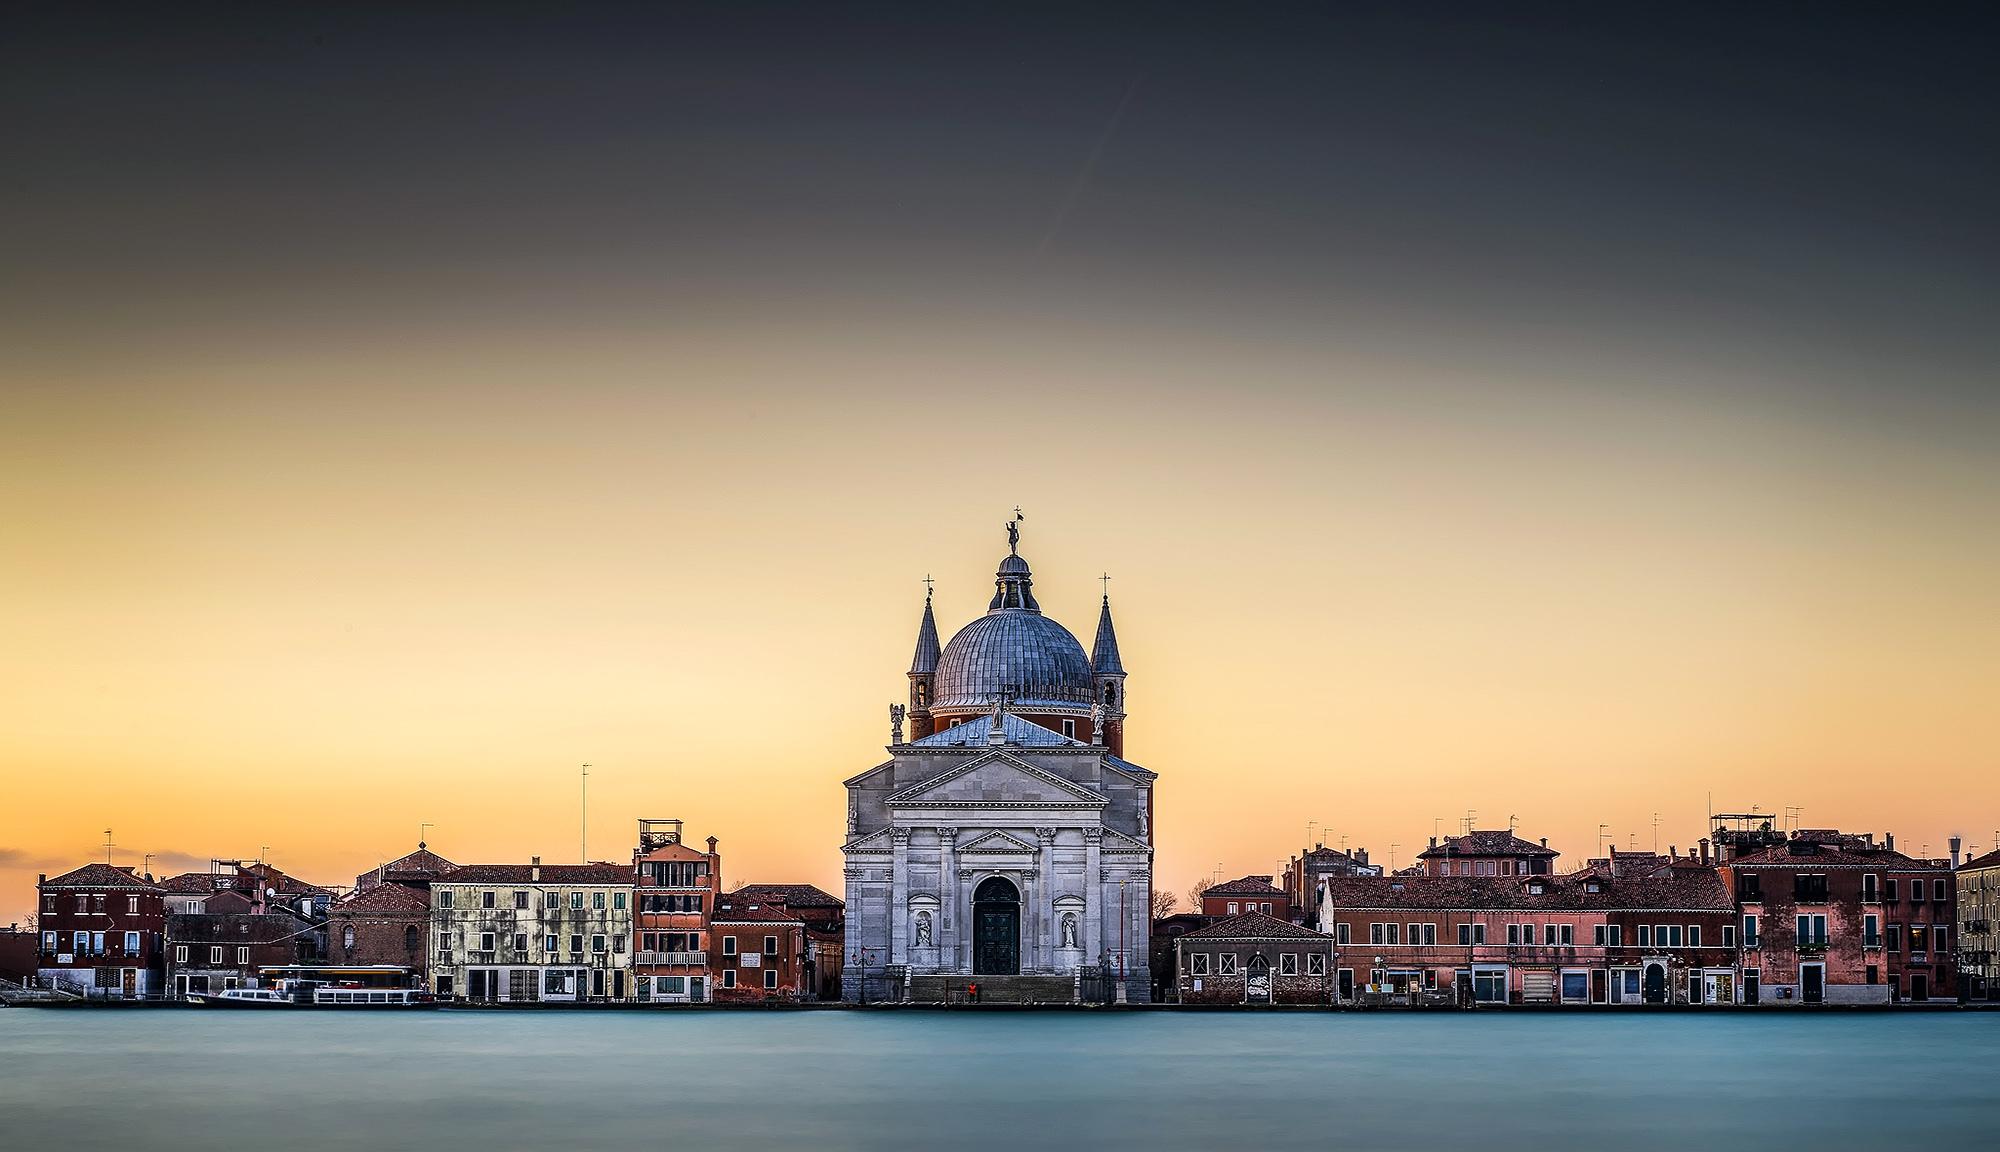 Church of the Santissimo Redentore Venice